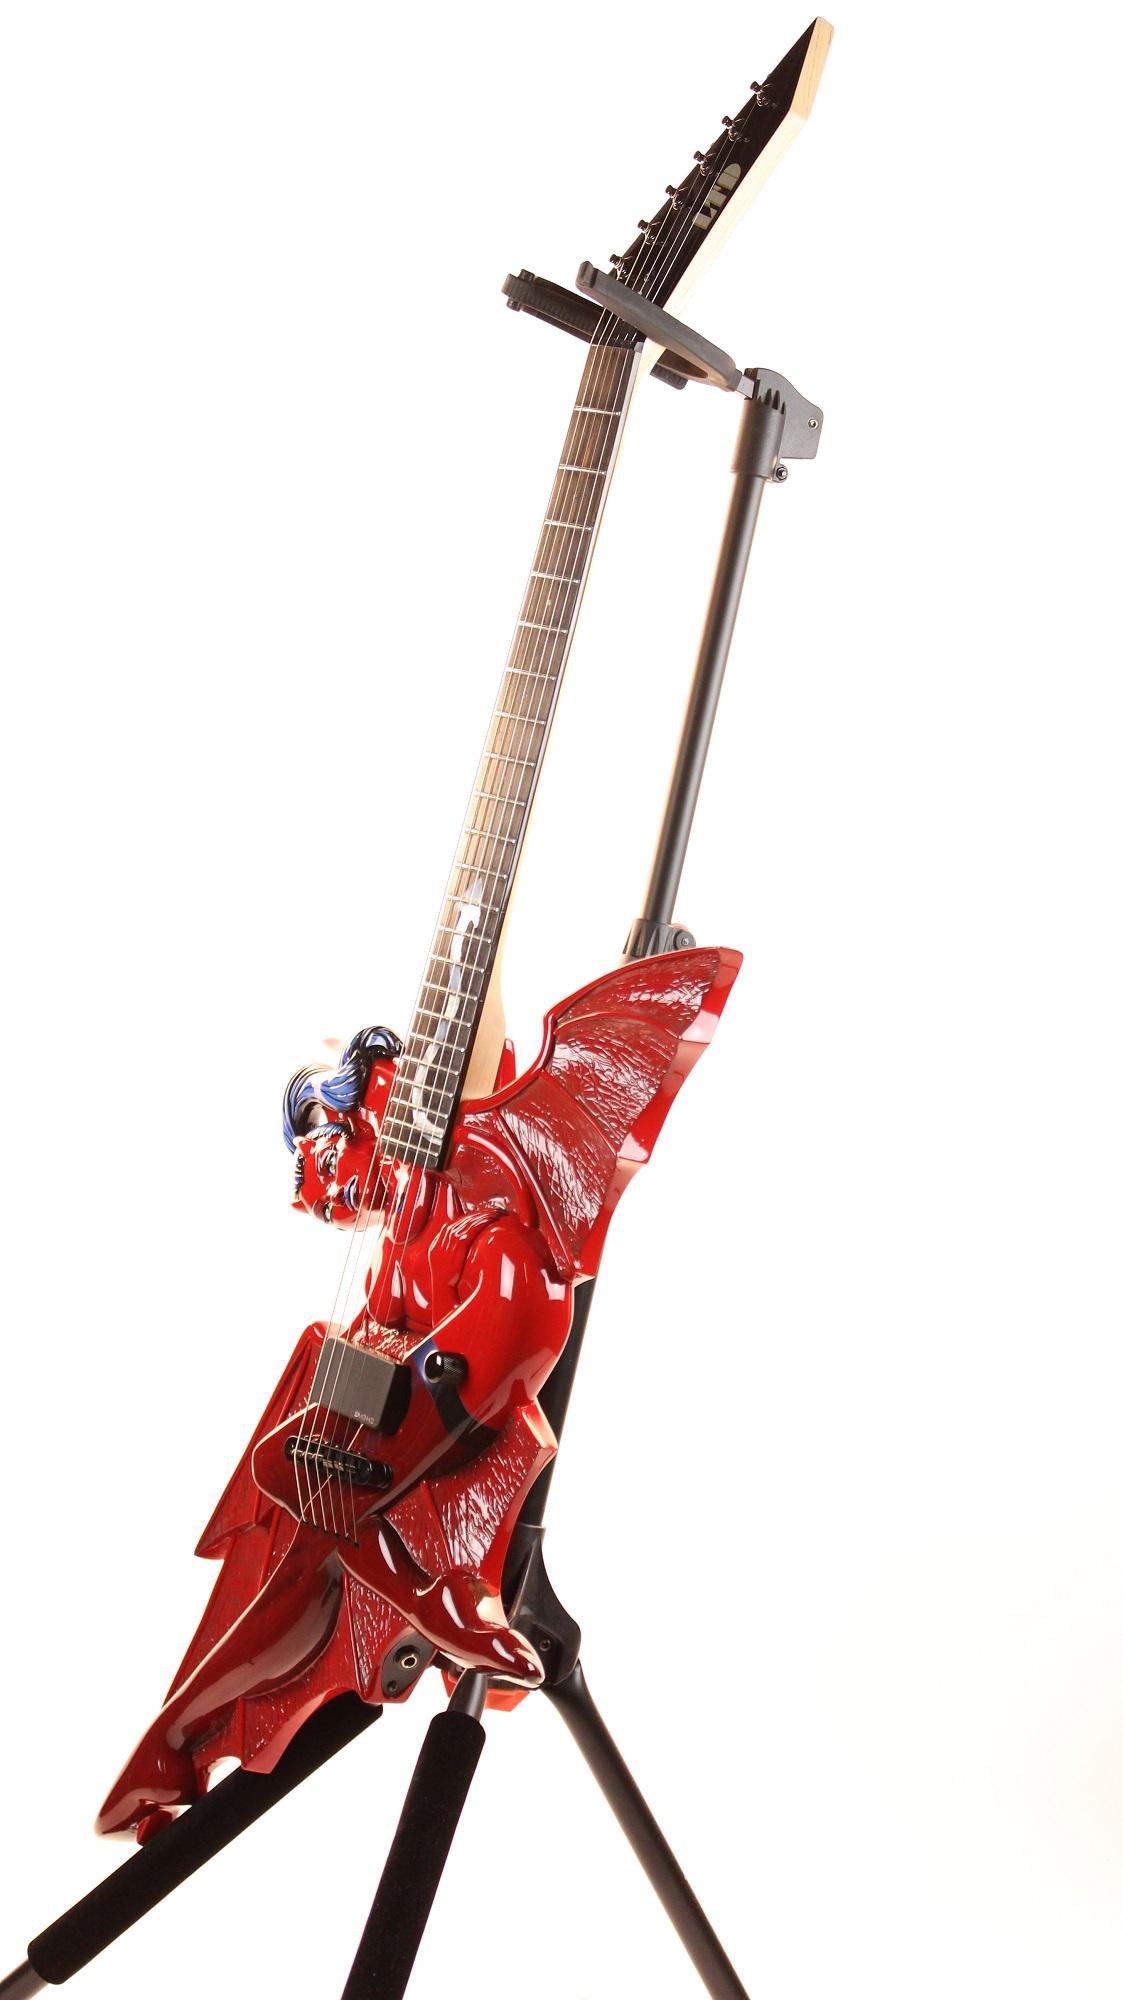 esp ltd devil girl electric guitar rare original prototype 6. Black Bedroom Furniture Sets. Home Design Ideas